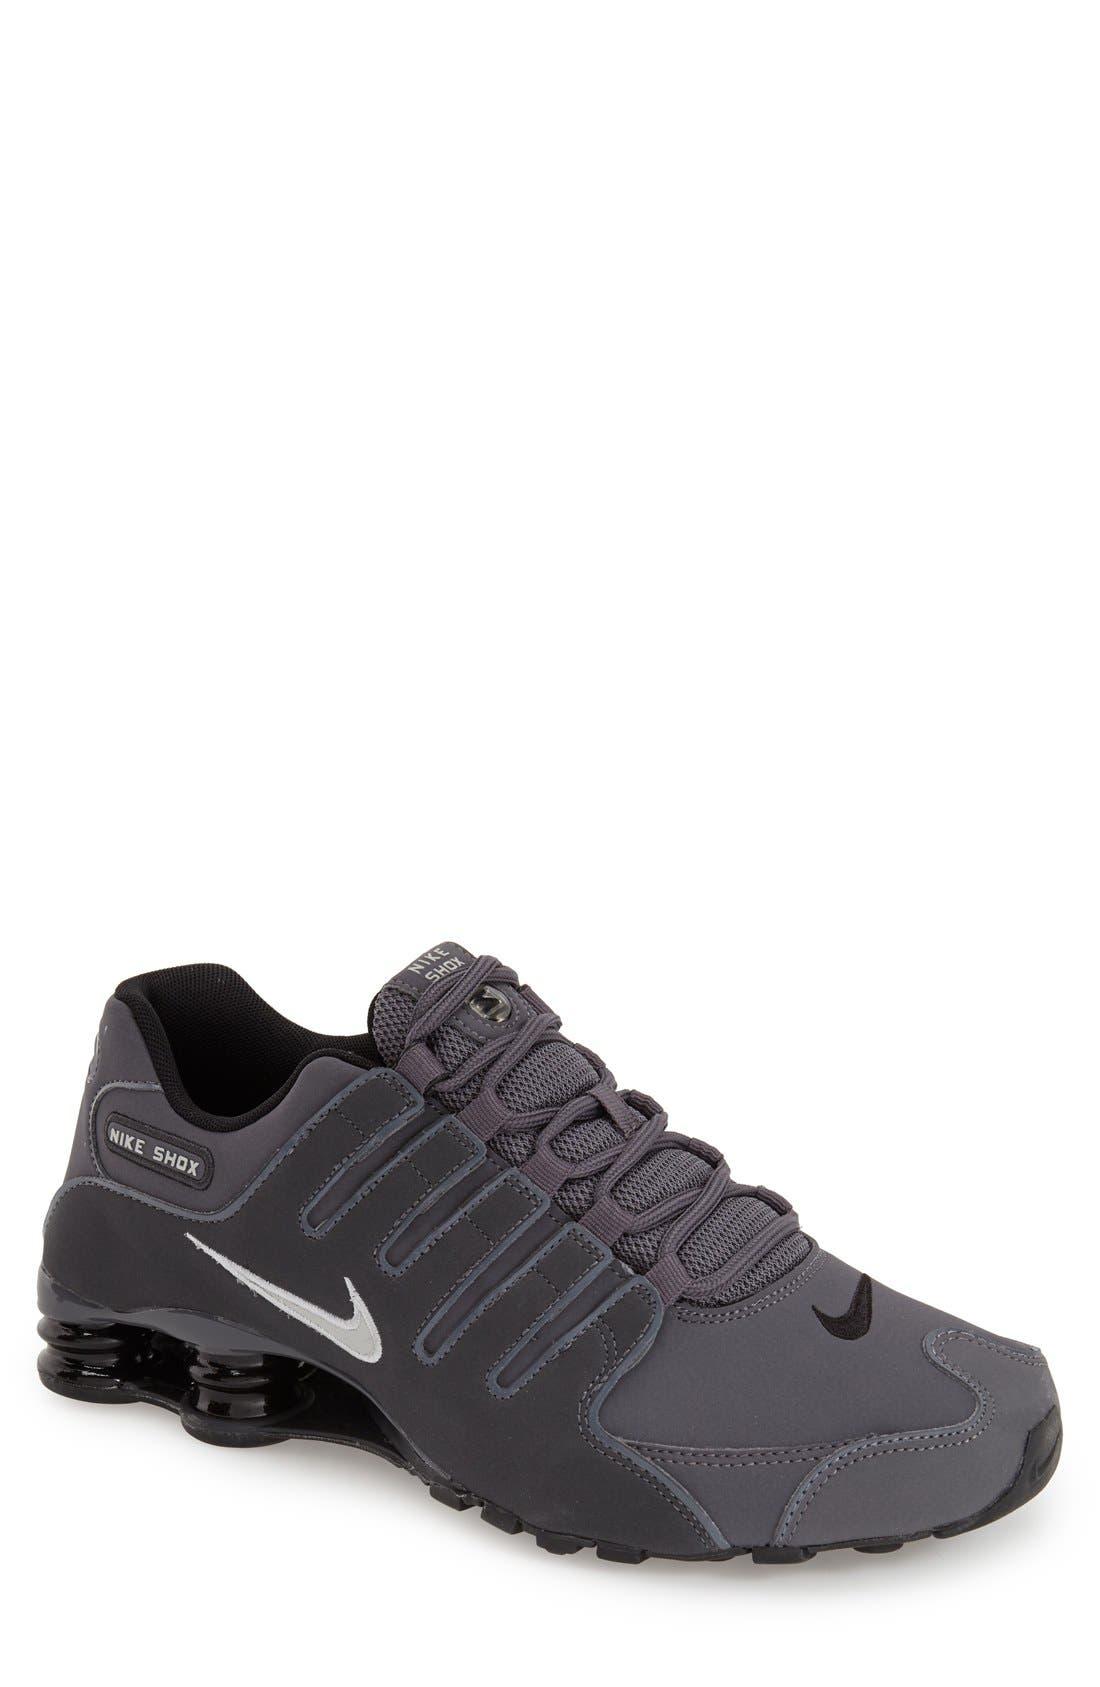 Alternate Image 1 Selected - Nike 'Shox NZ' Running Shoe (Men)